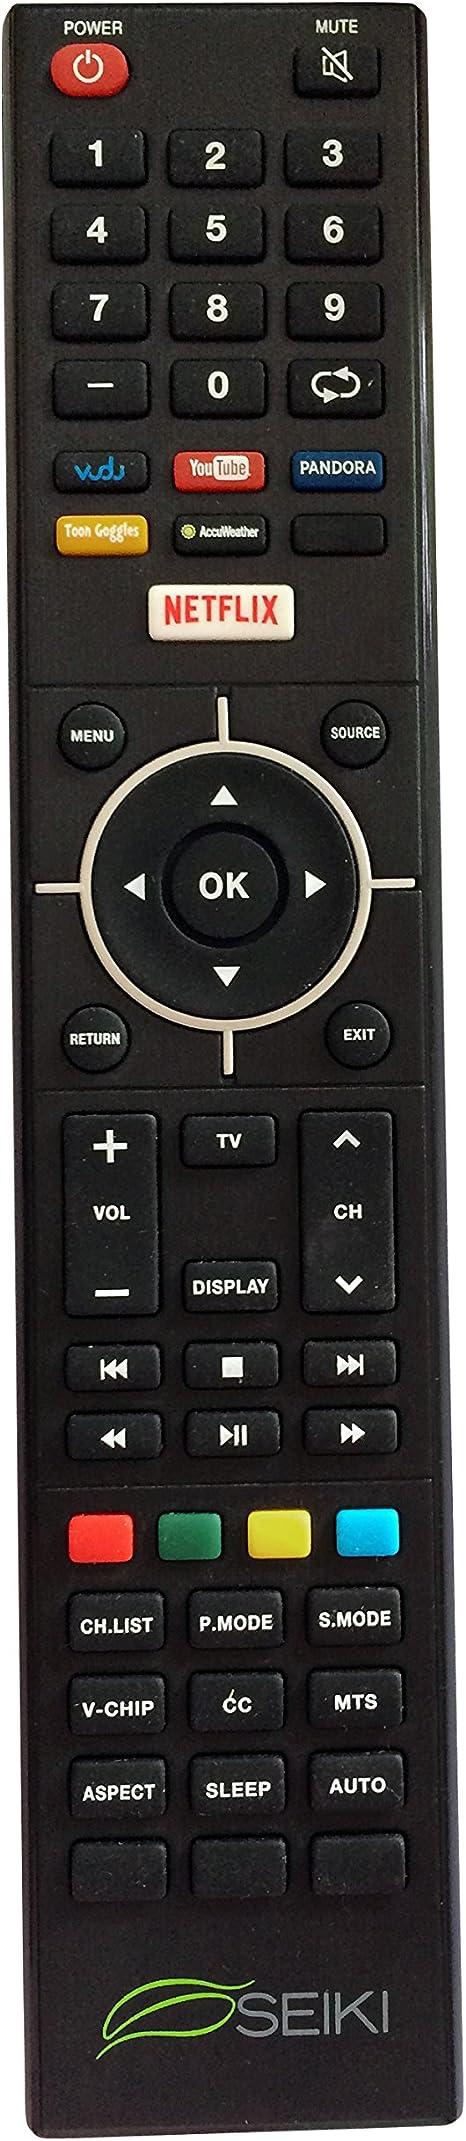 Nueva Seiki Seiki Smart TV Mando a Distancia para SEIKI se32hy19t Smart TV Mando a Distancia: Amazon.es: Electrónica